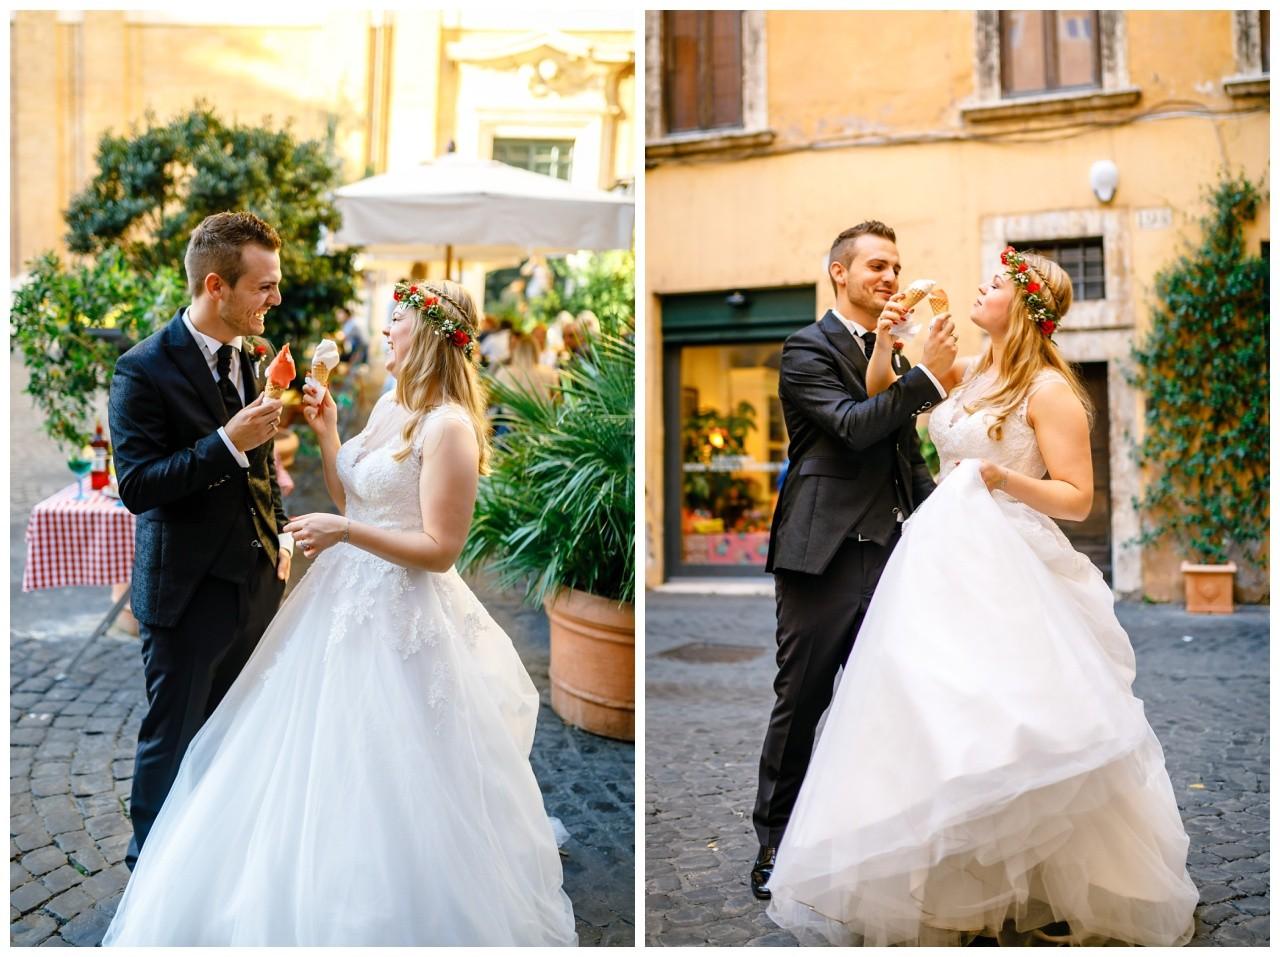 Hochzeitsfotos Rom After Wedding Shooting Hochzeitsfotograf Italien 03 - After Wedding Shooting in Rom